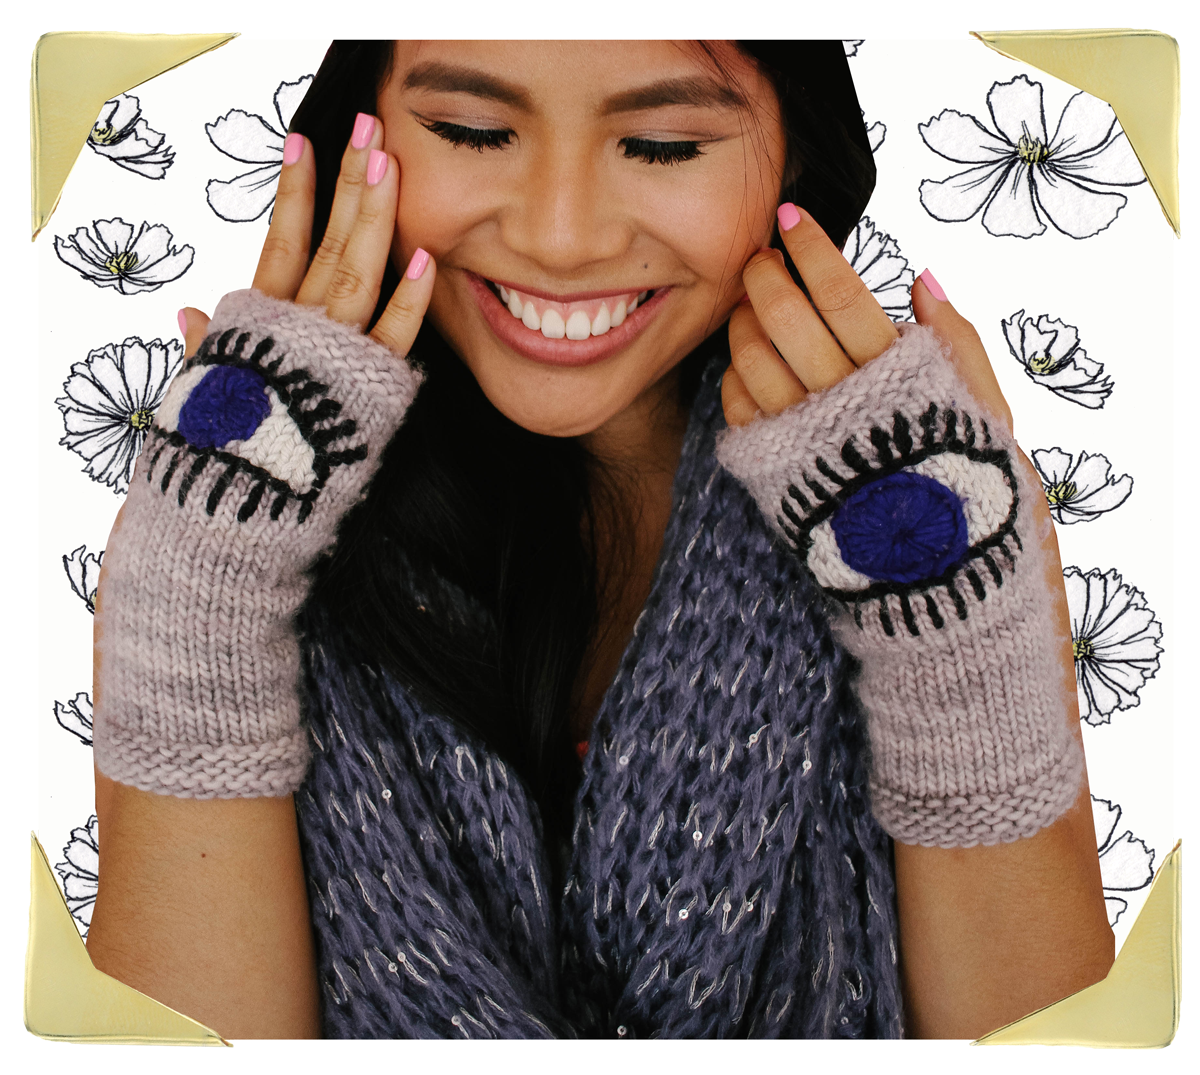 Krista Suh Wearing Evil Eye Gloves